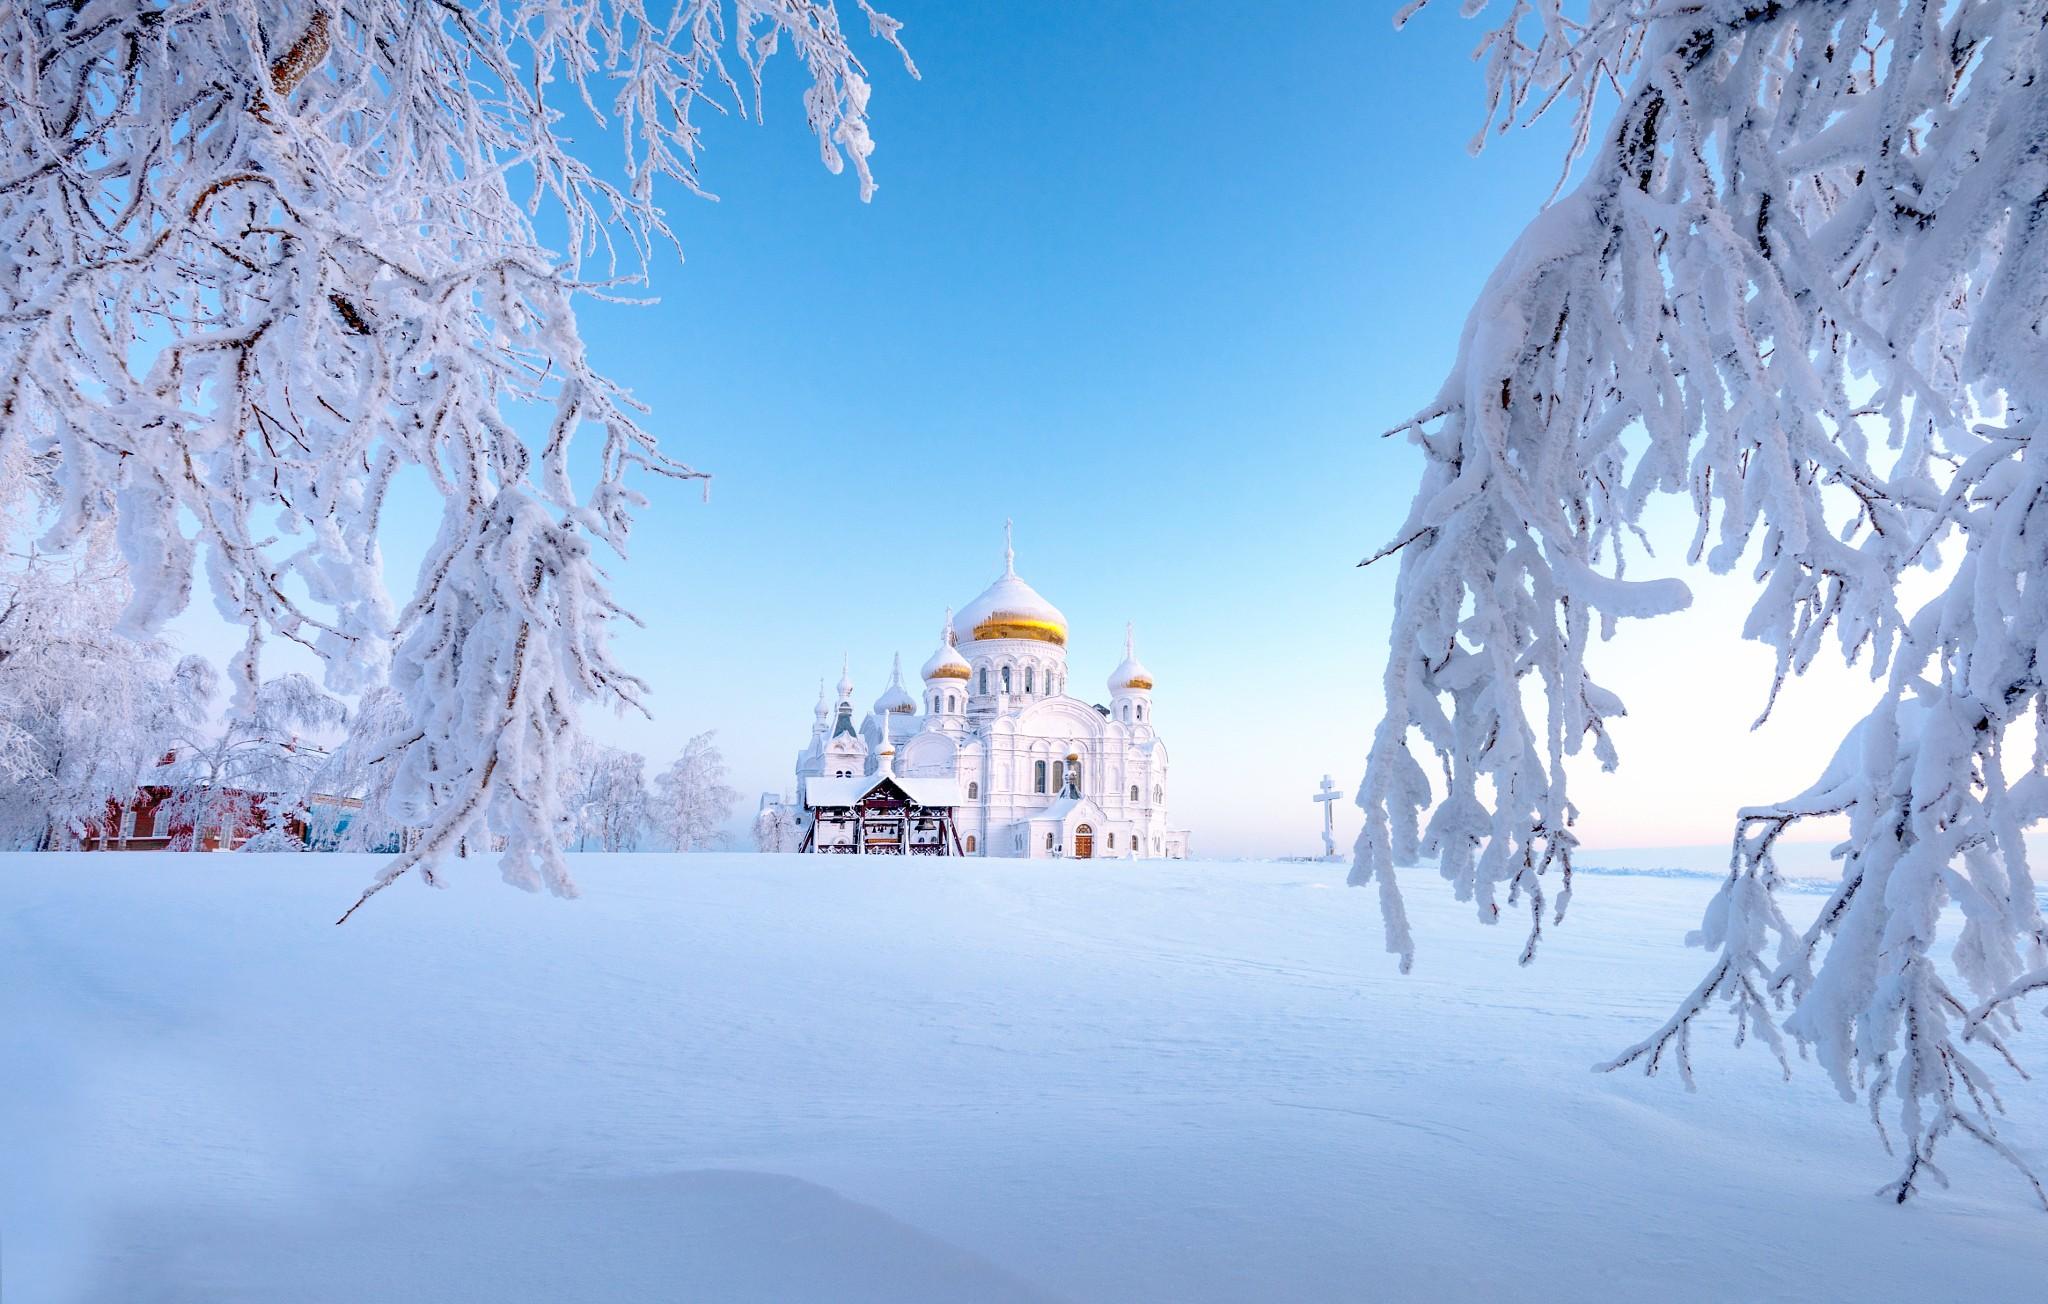 General 2048x1304 Ural winter Russia snow